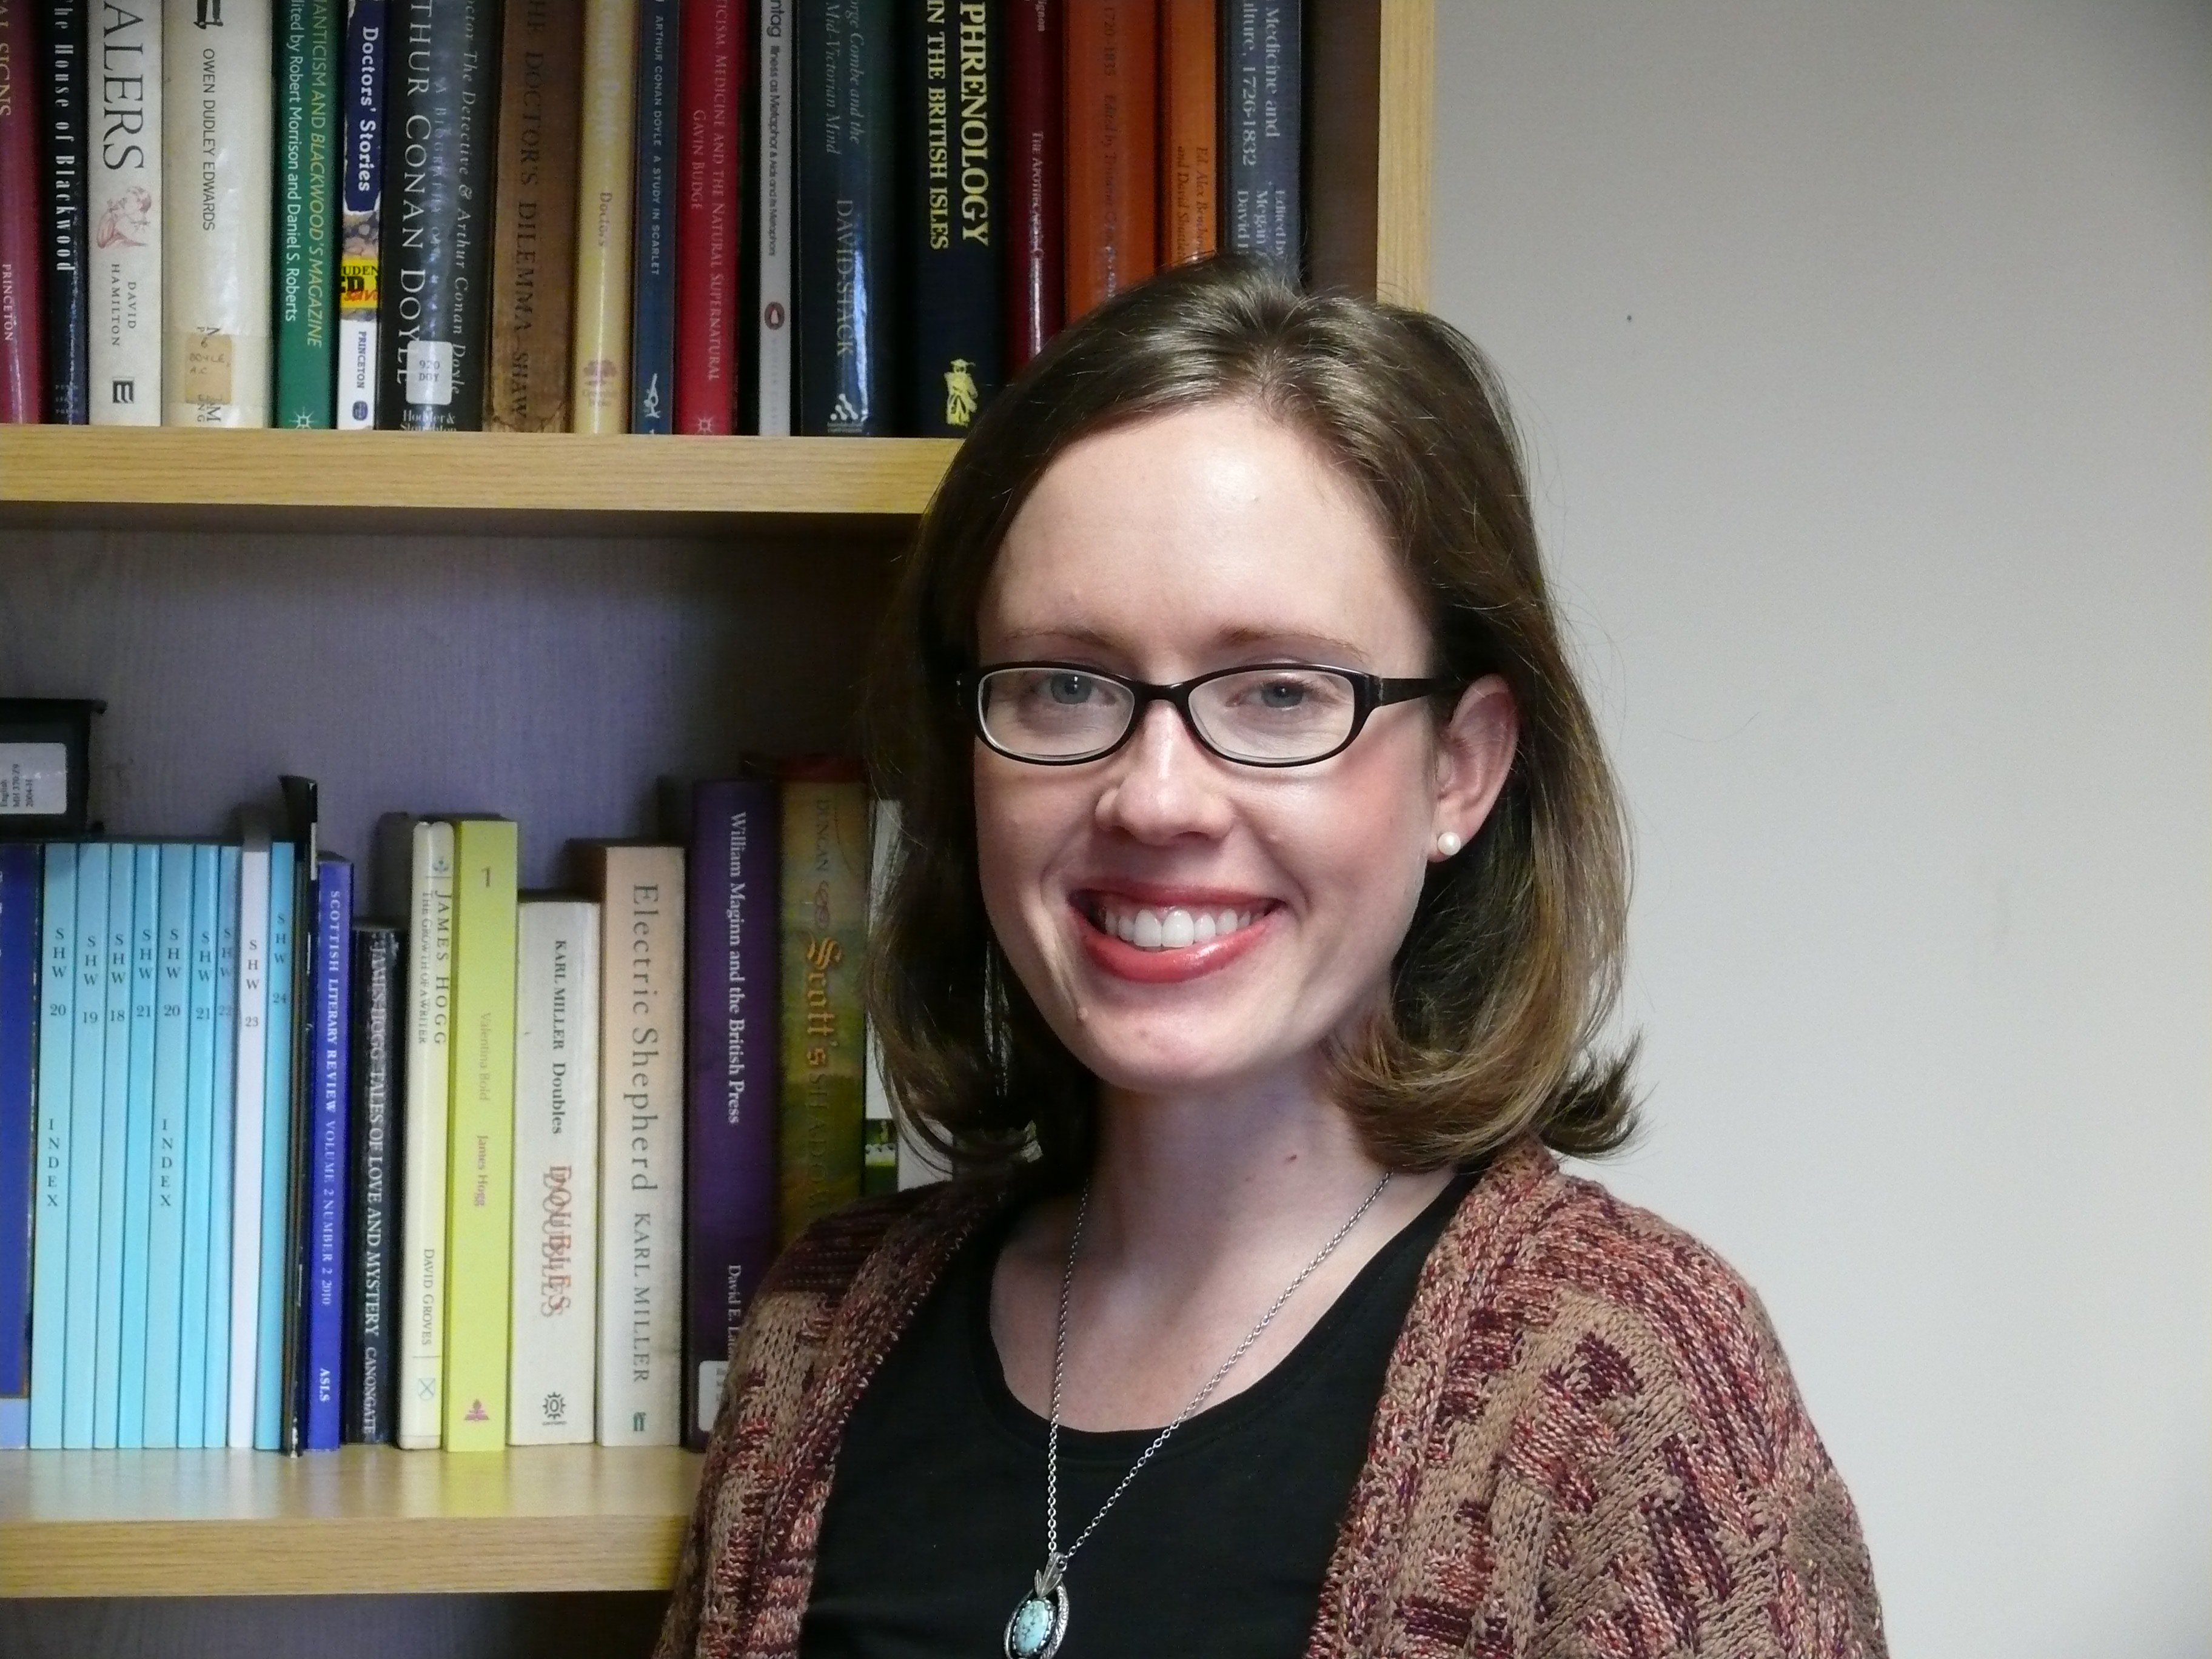 Megan Coyer